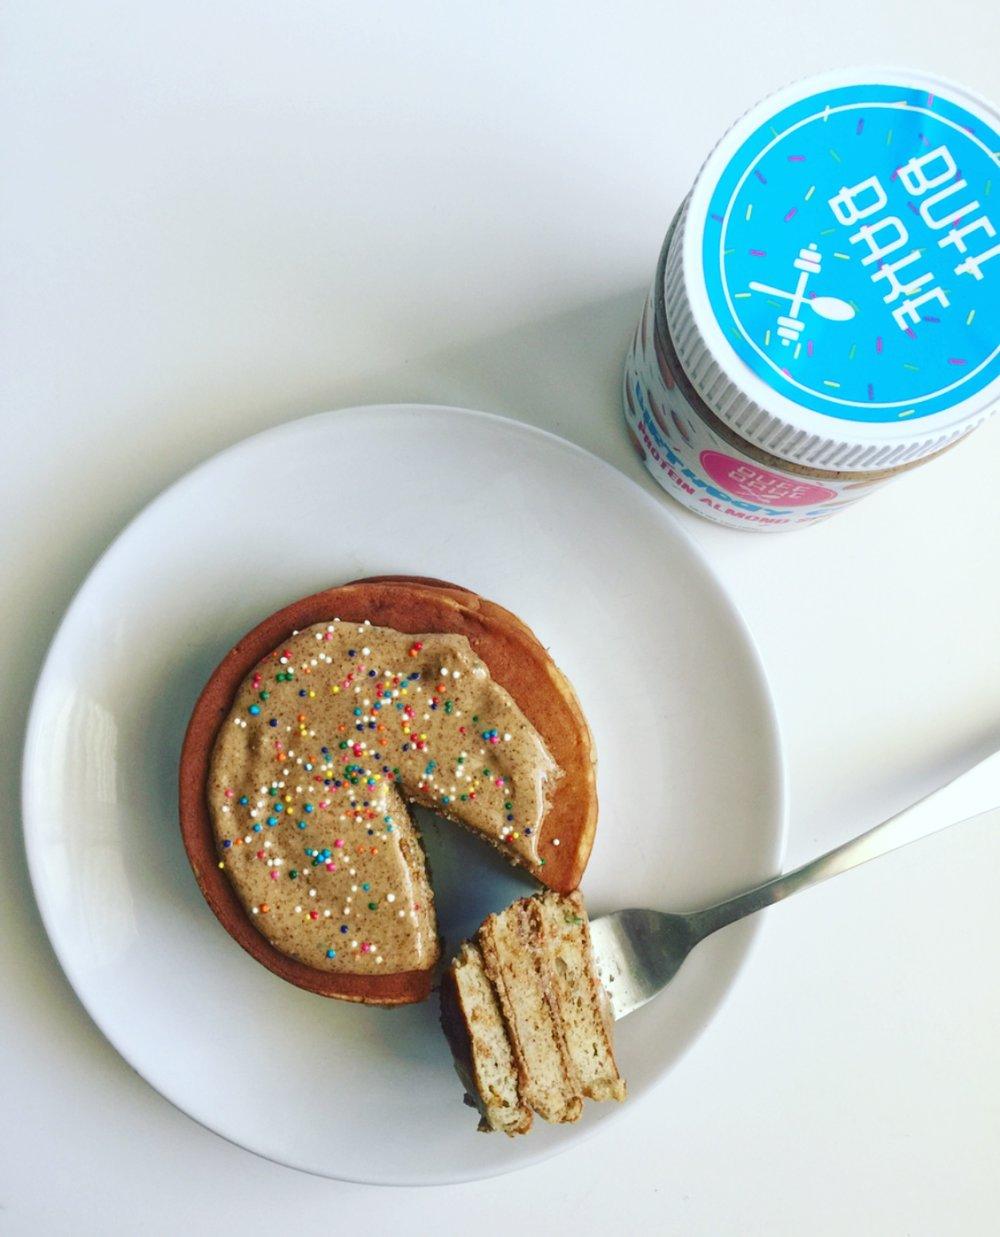 Birthday Cake Protein Pancakes 2.jpg